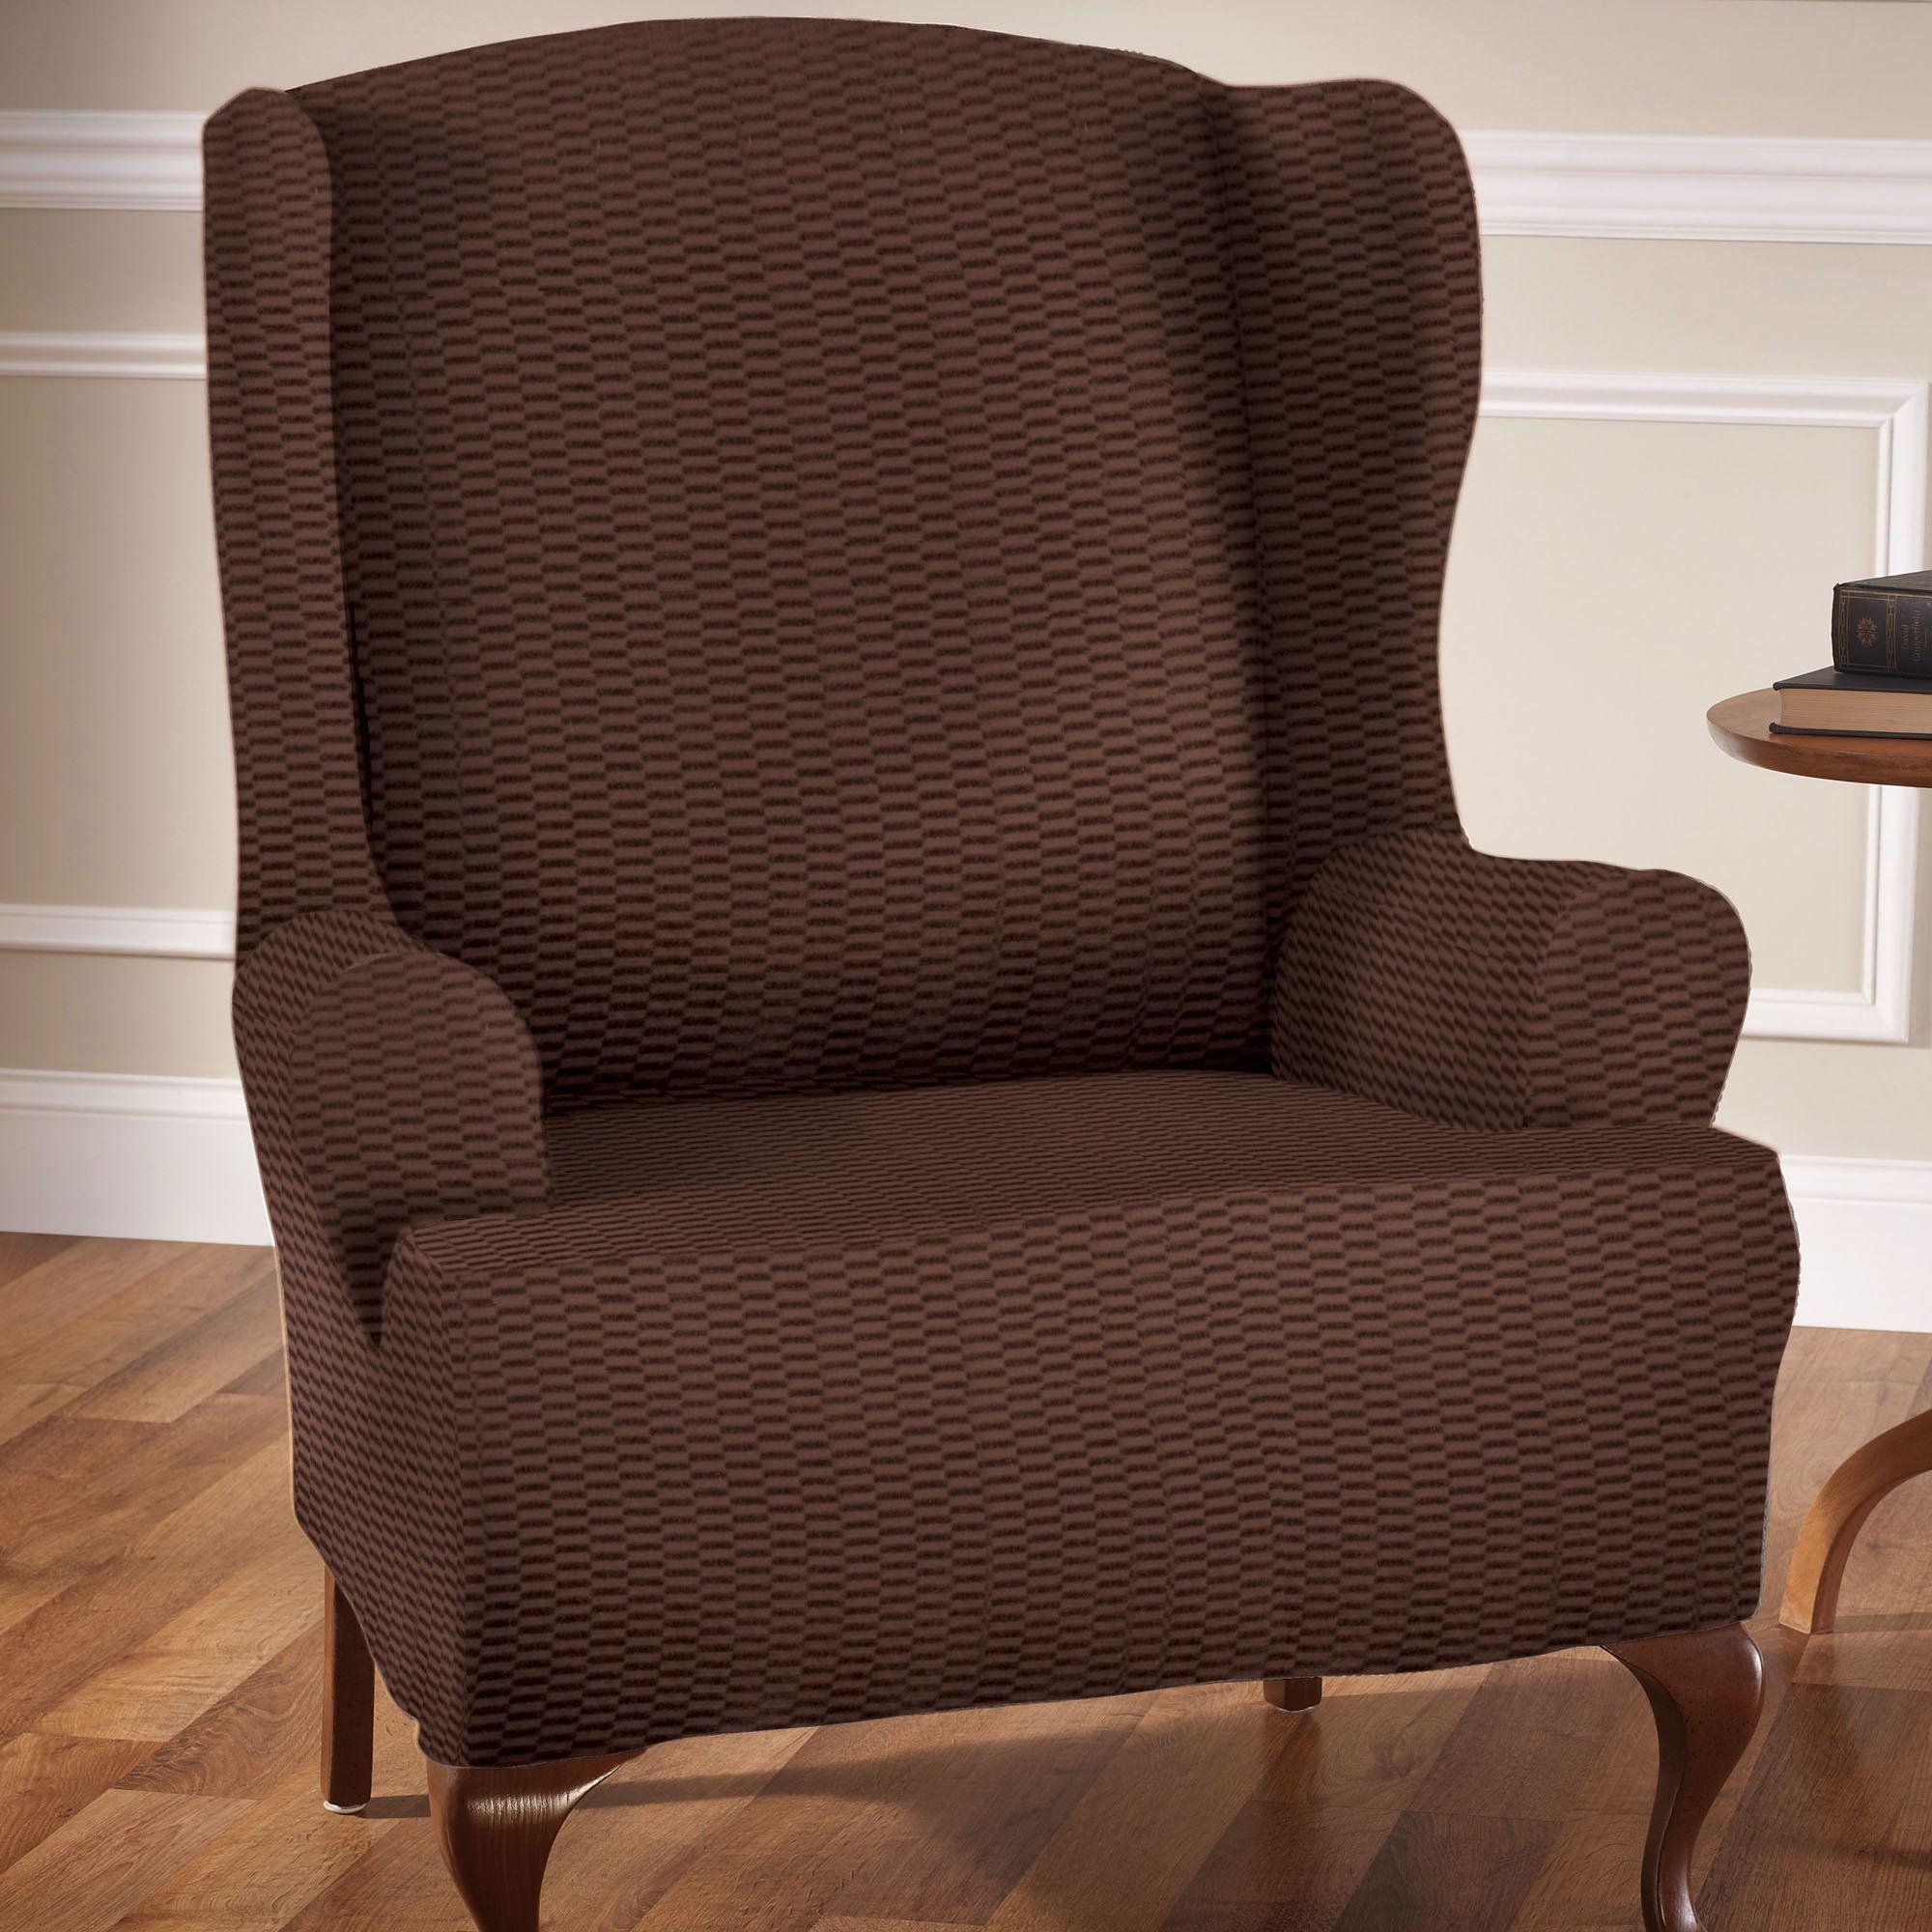 Cushty Raise Bar Wing Chair Stretch Slipcover Raise Bar Stretch Wing Chair Slipcovers Wing Chair Slipcover Wing Chair Slipcover No T Cushion baby Wing Chair Slipcover